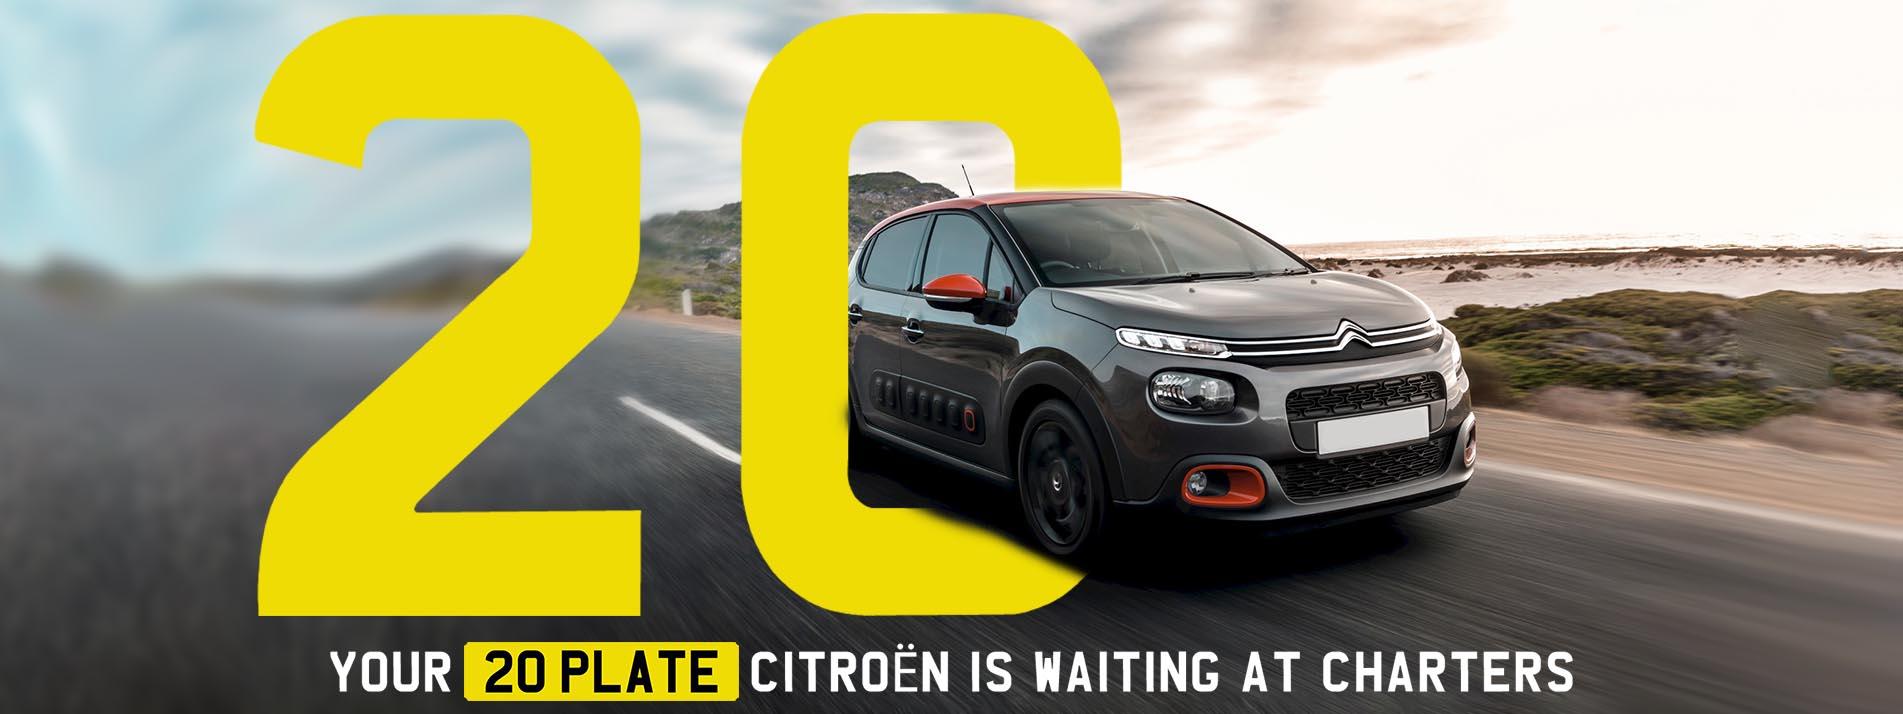 citroen-20-plate-new-cars-in-aldershot-hampshire-m-sli